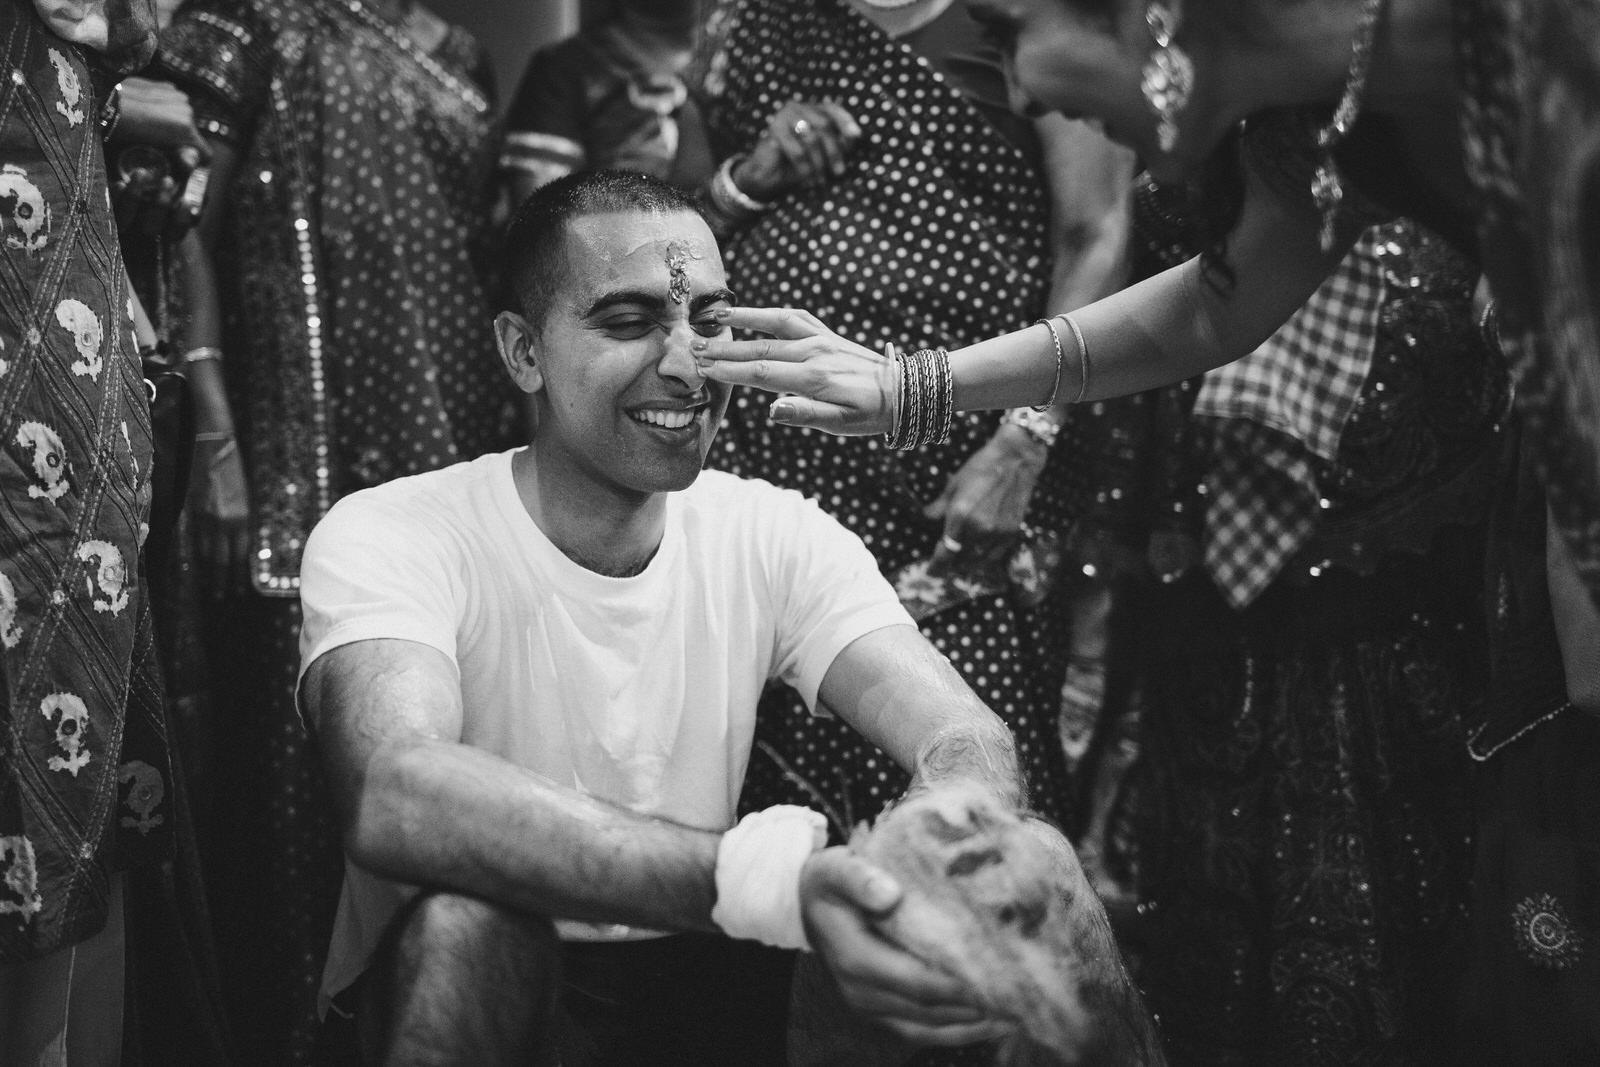 destination-wedding-photographer-Kerala-india-10.JPG